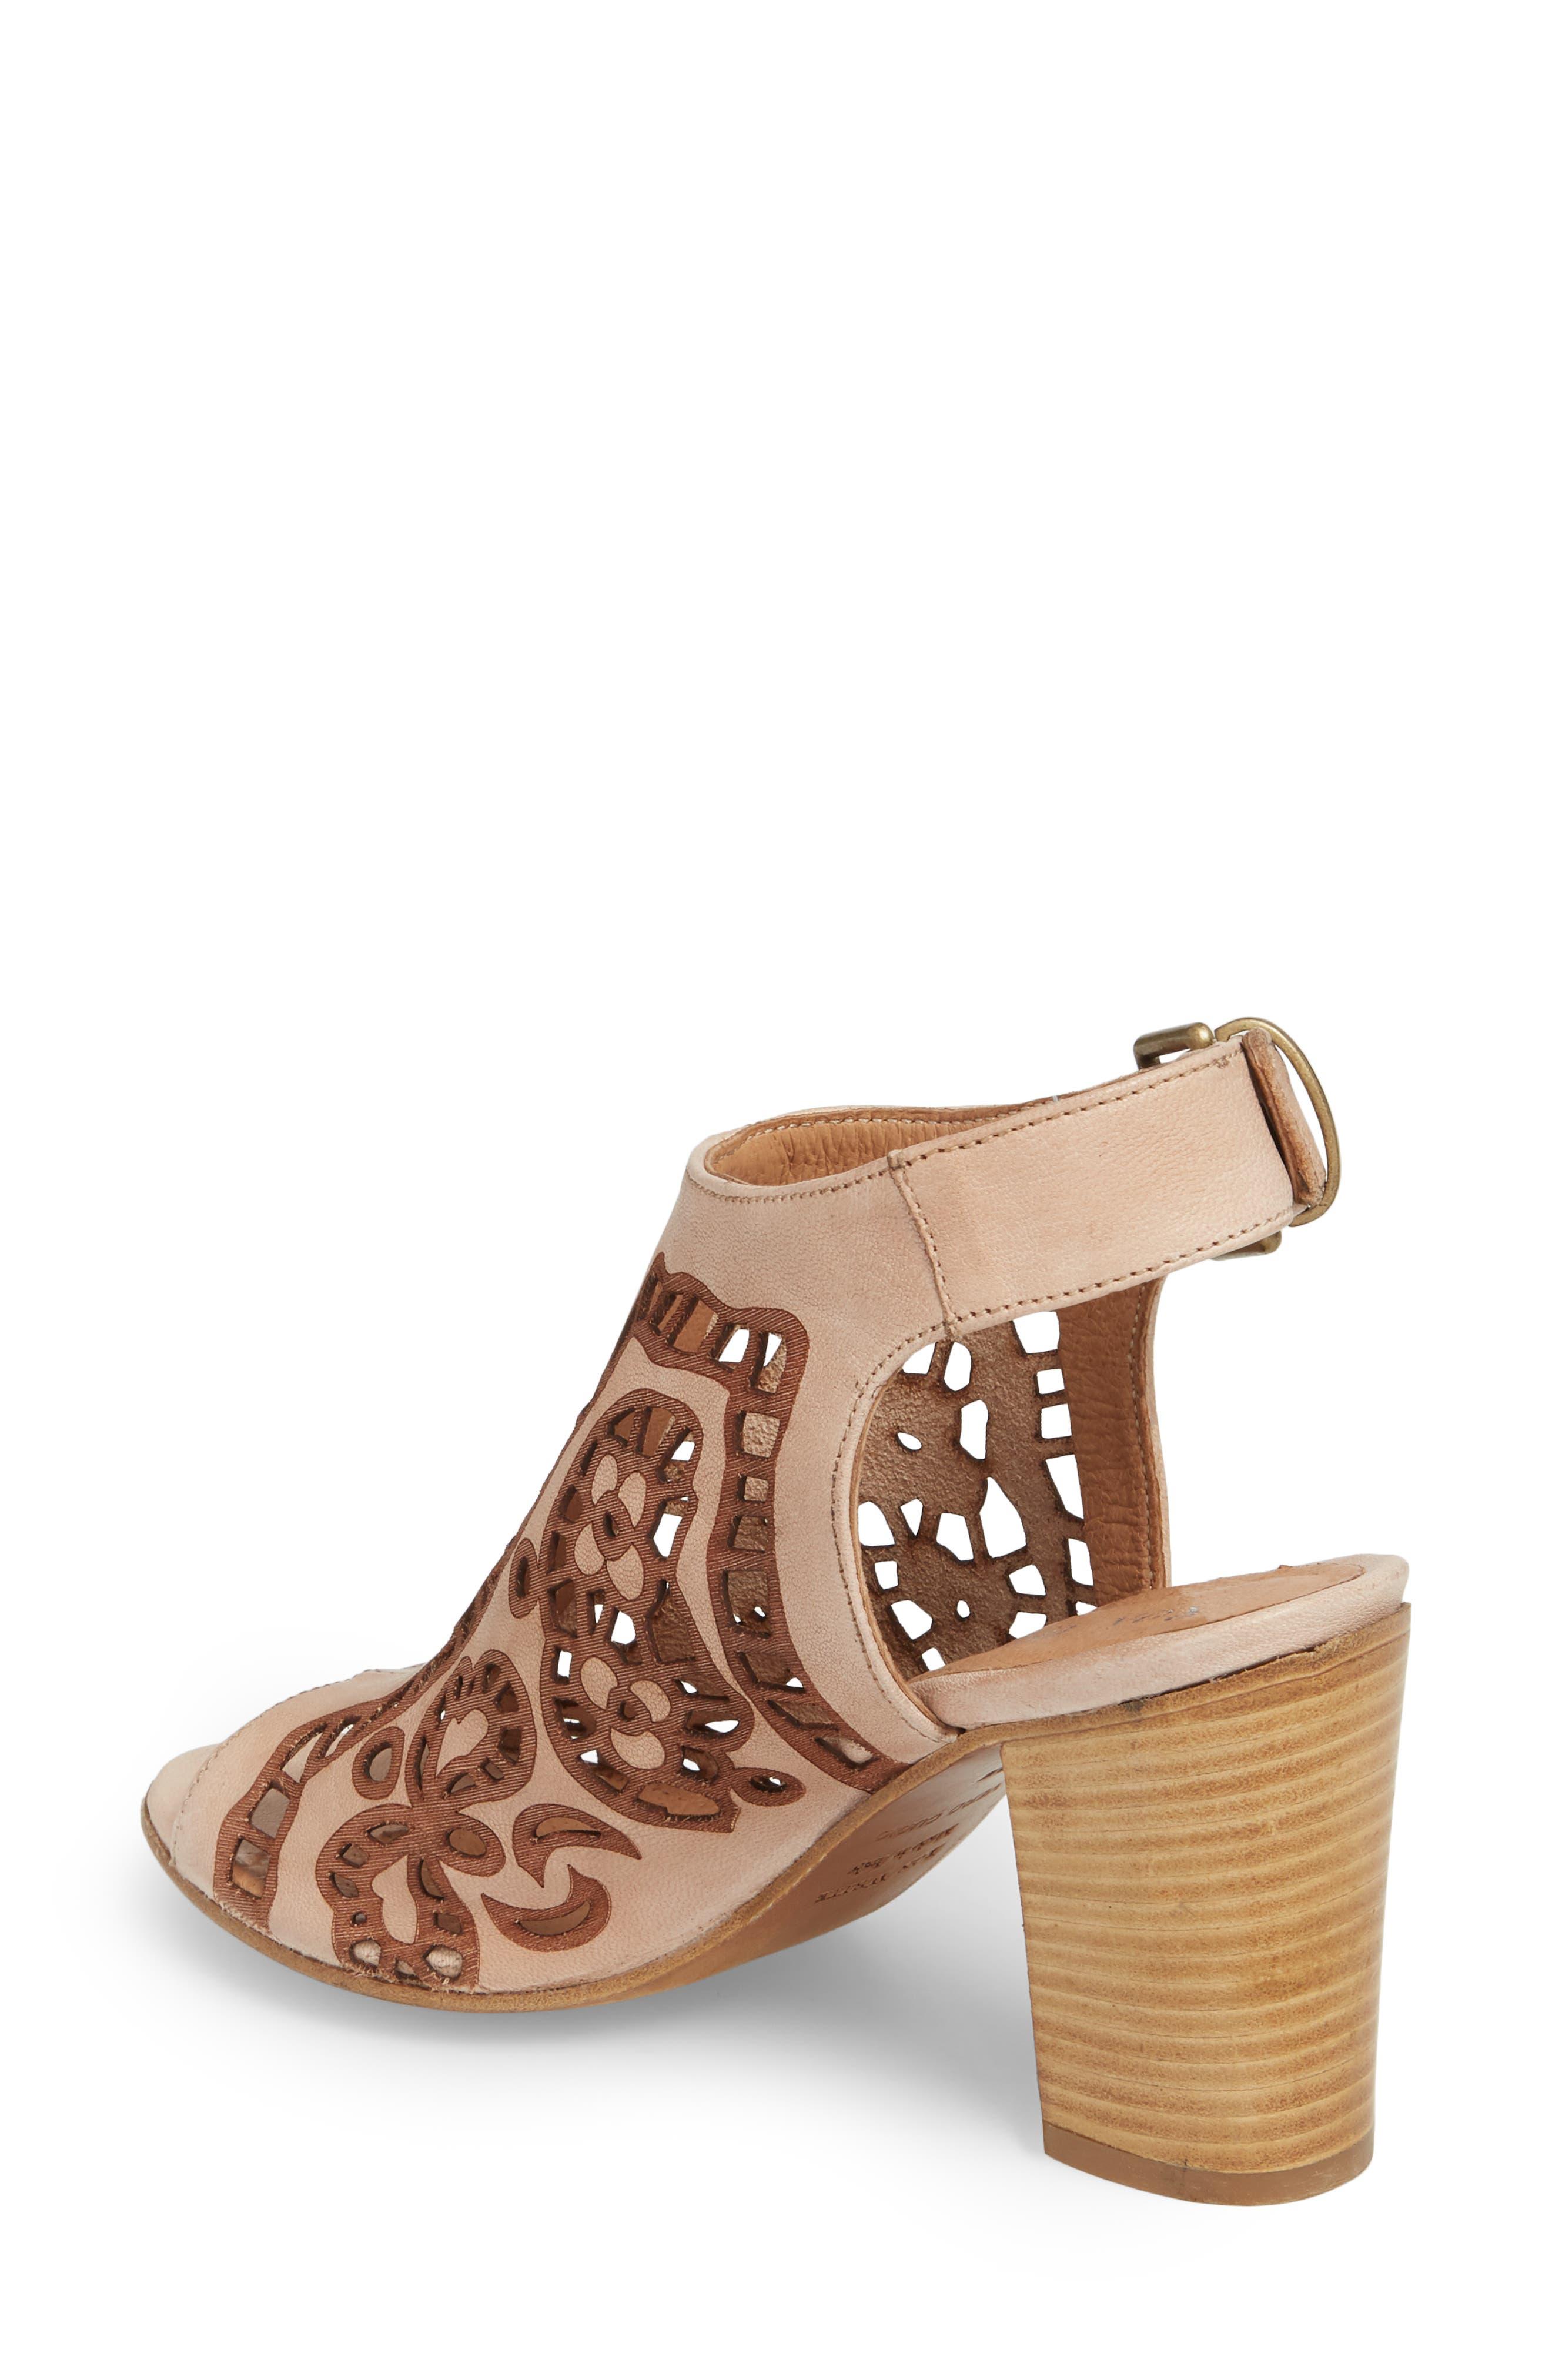 Sabrina Floral Cutout Shield Sandal,                             Alternate thumbnail 2, color,                             Blush Leather